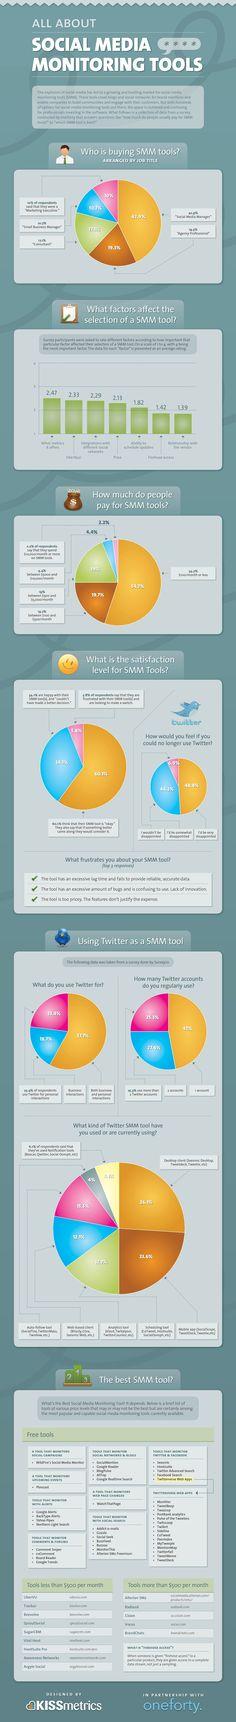 #SocialMedia Monitoring Tools [Infographic]